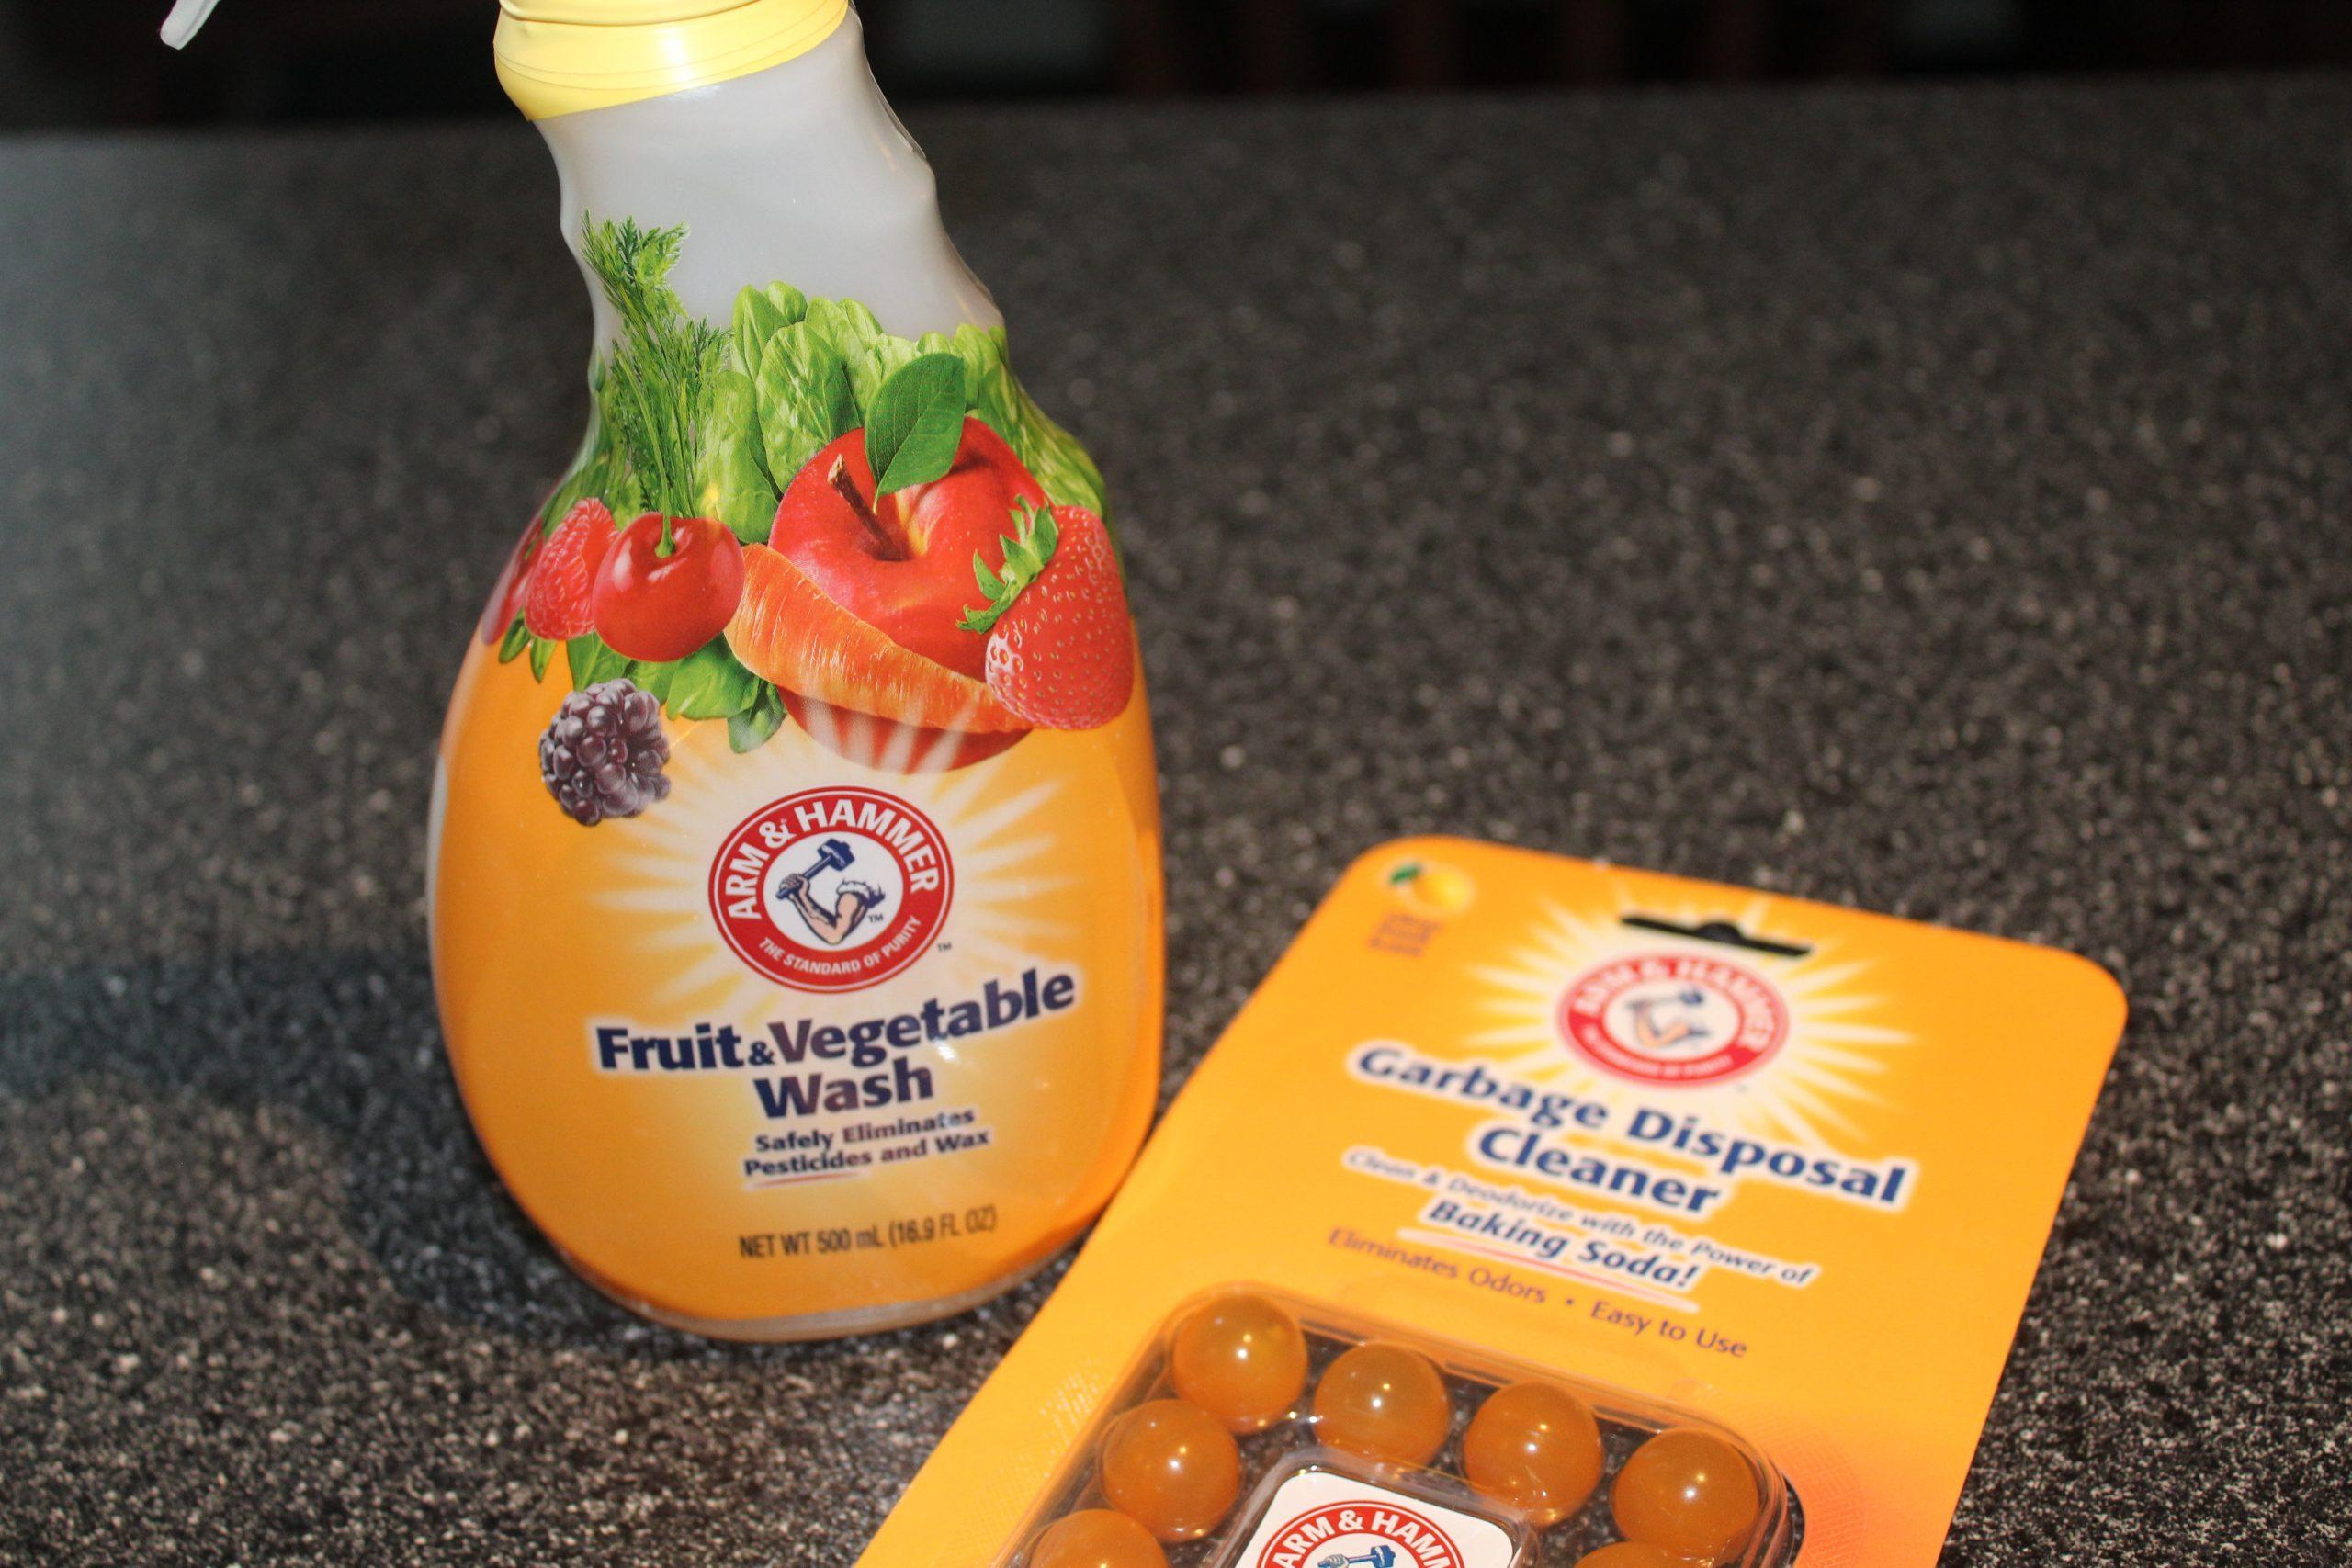 Arm & Hammer Garbage Disposal Cleaner & Fruit & Vegetable Wash #Review #HGG19